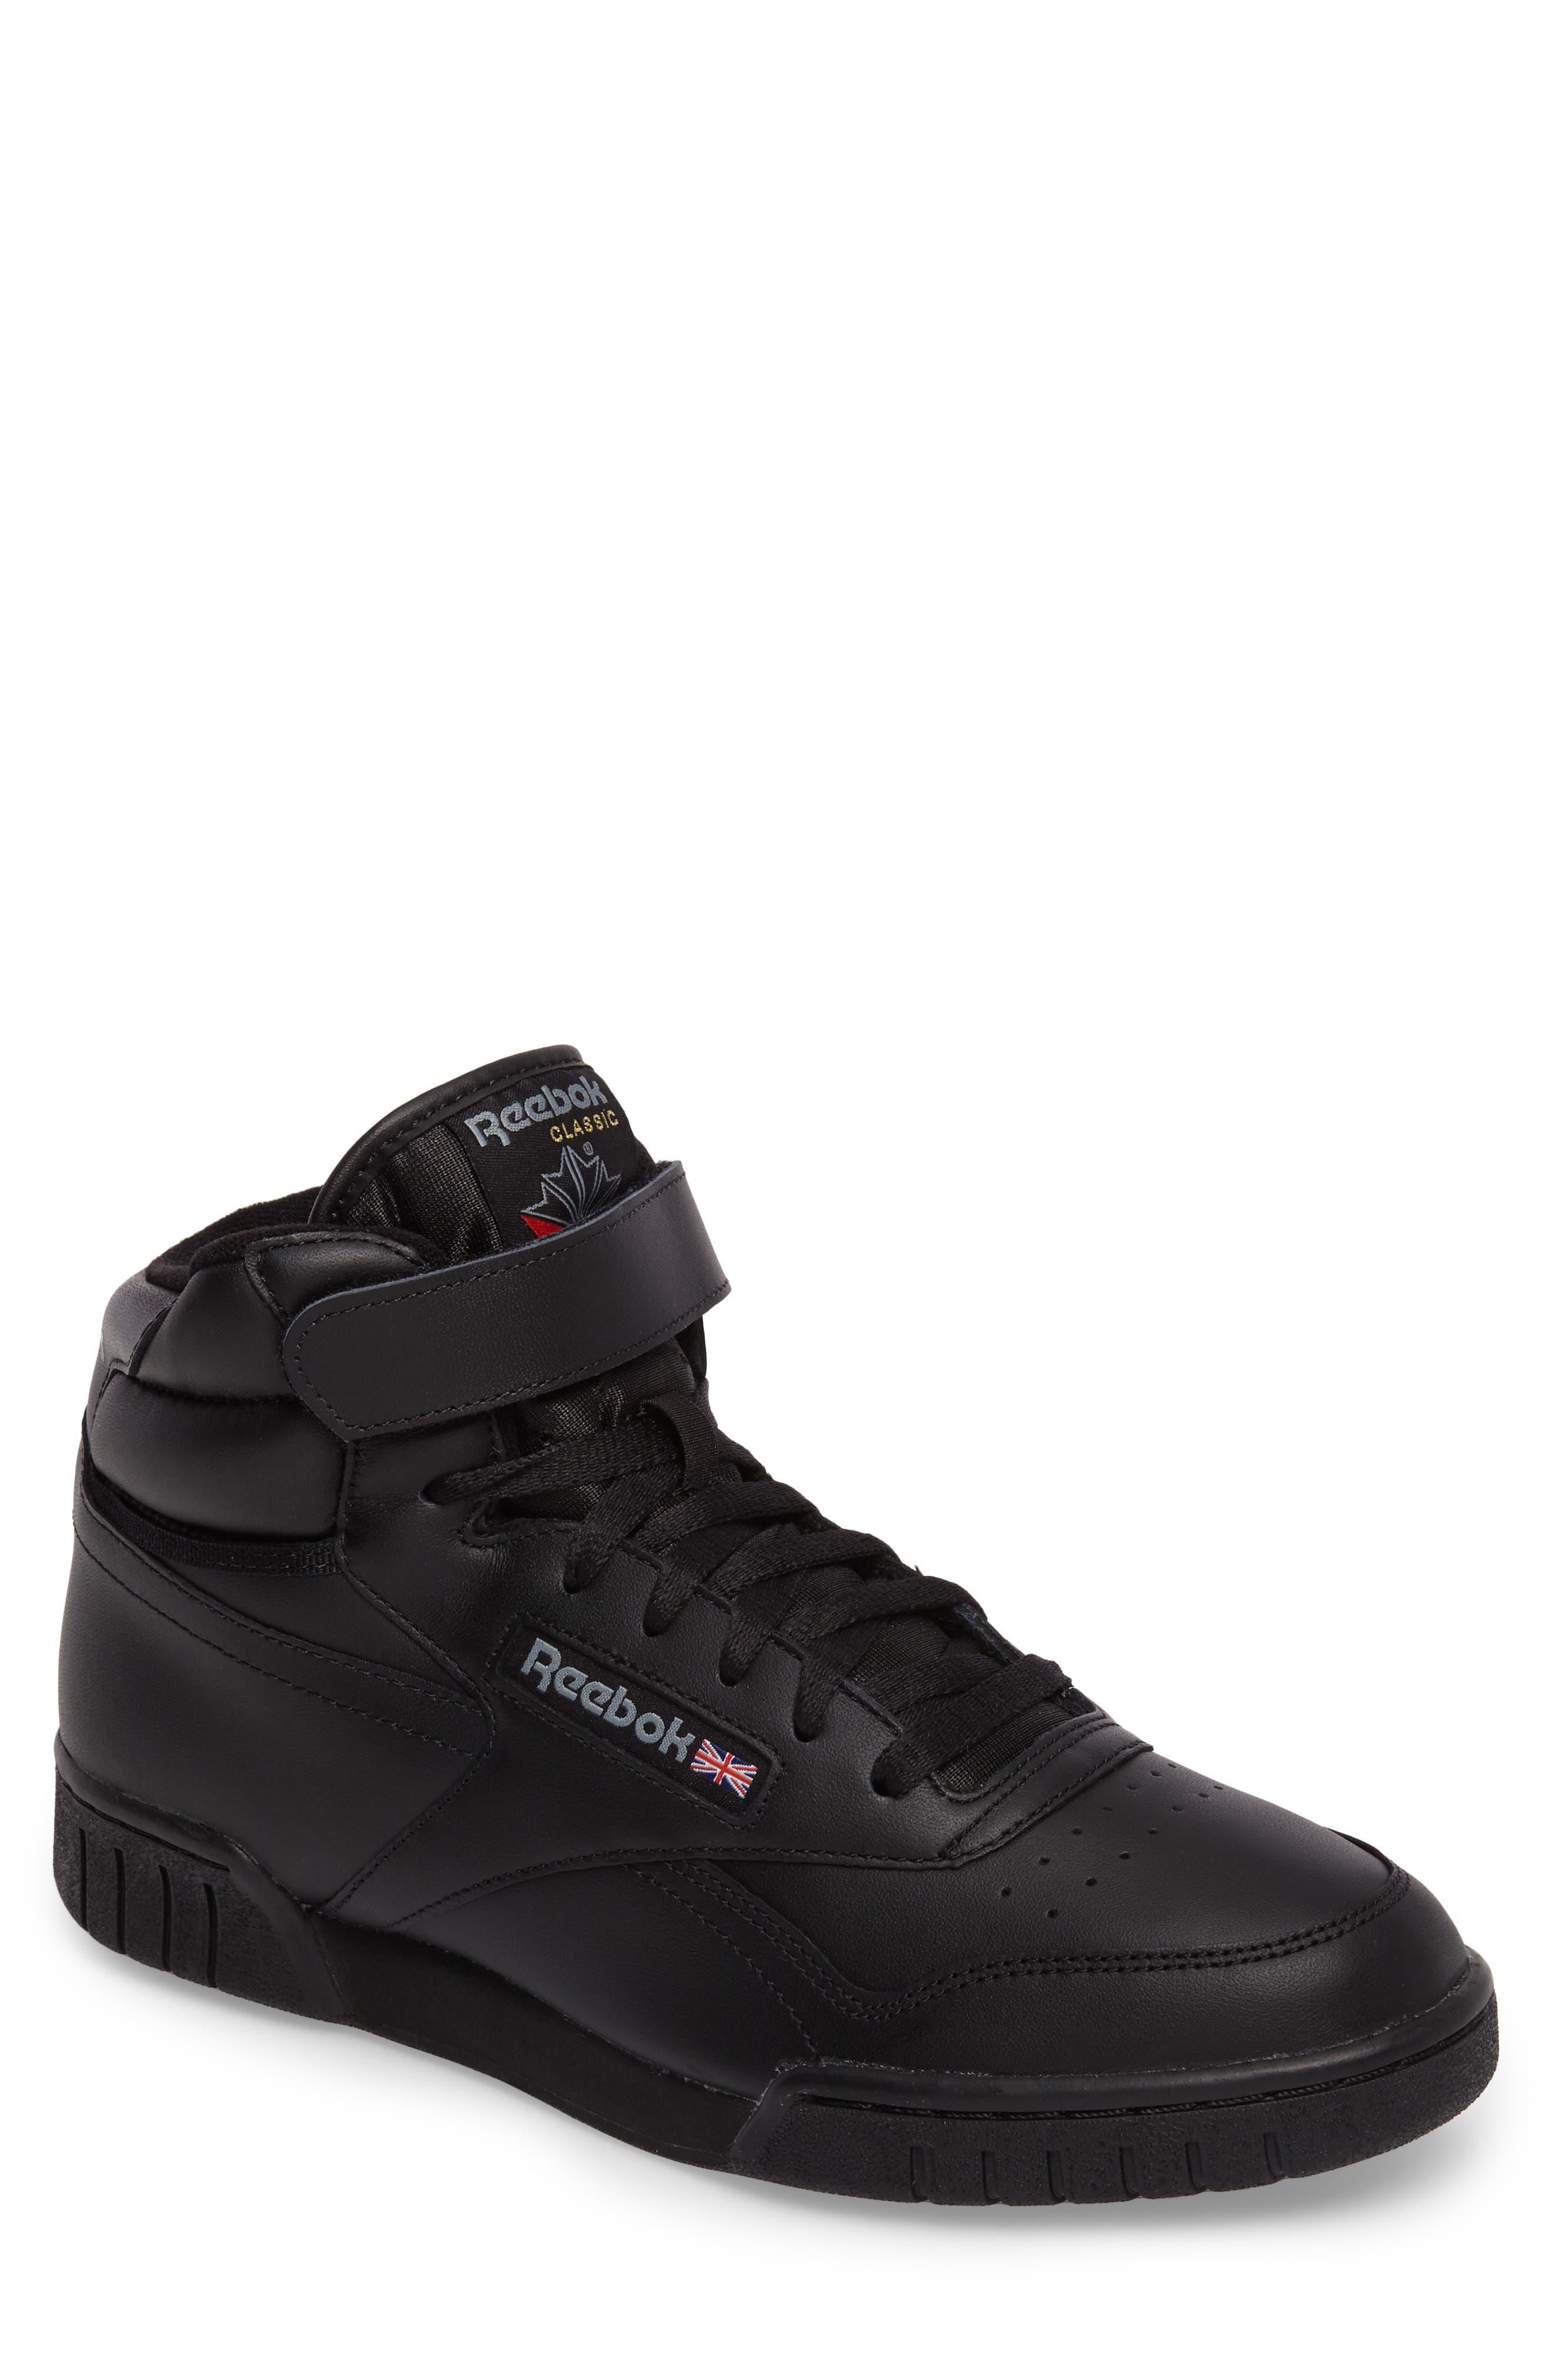 Ex-O-Fit Hi Sneaker,                             Main thumbnail 1, color,                             Black